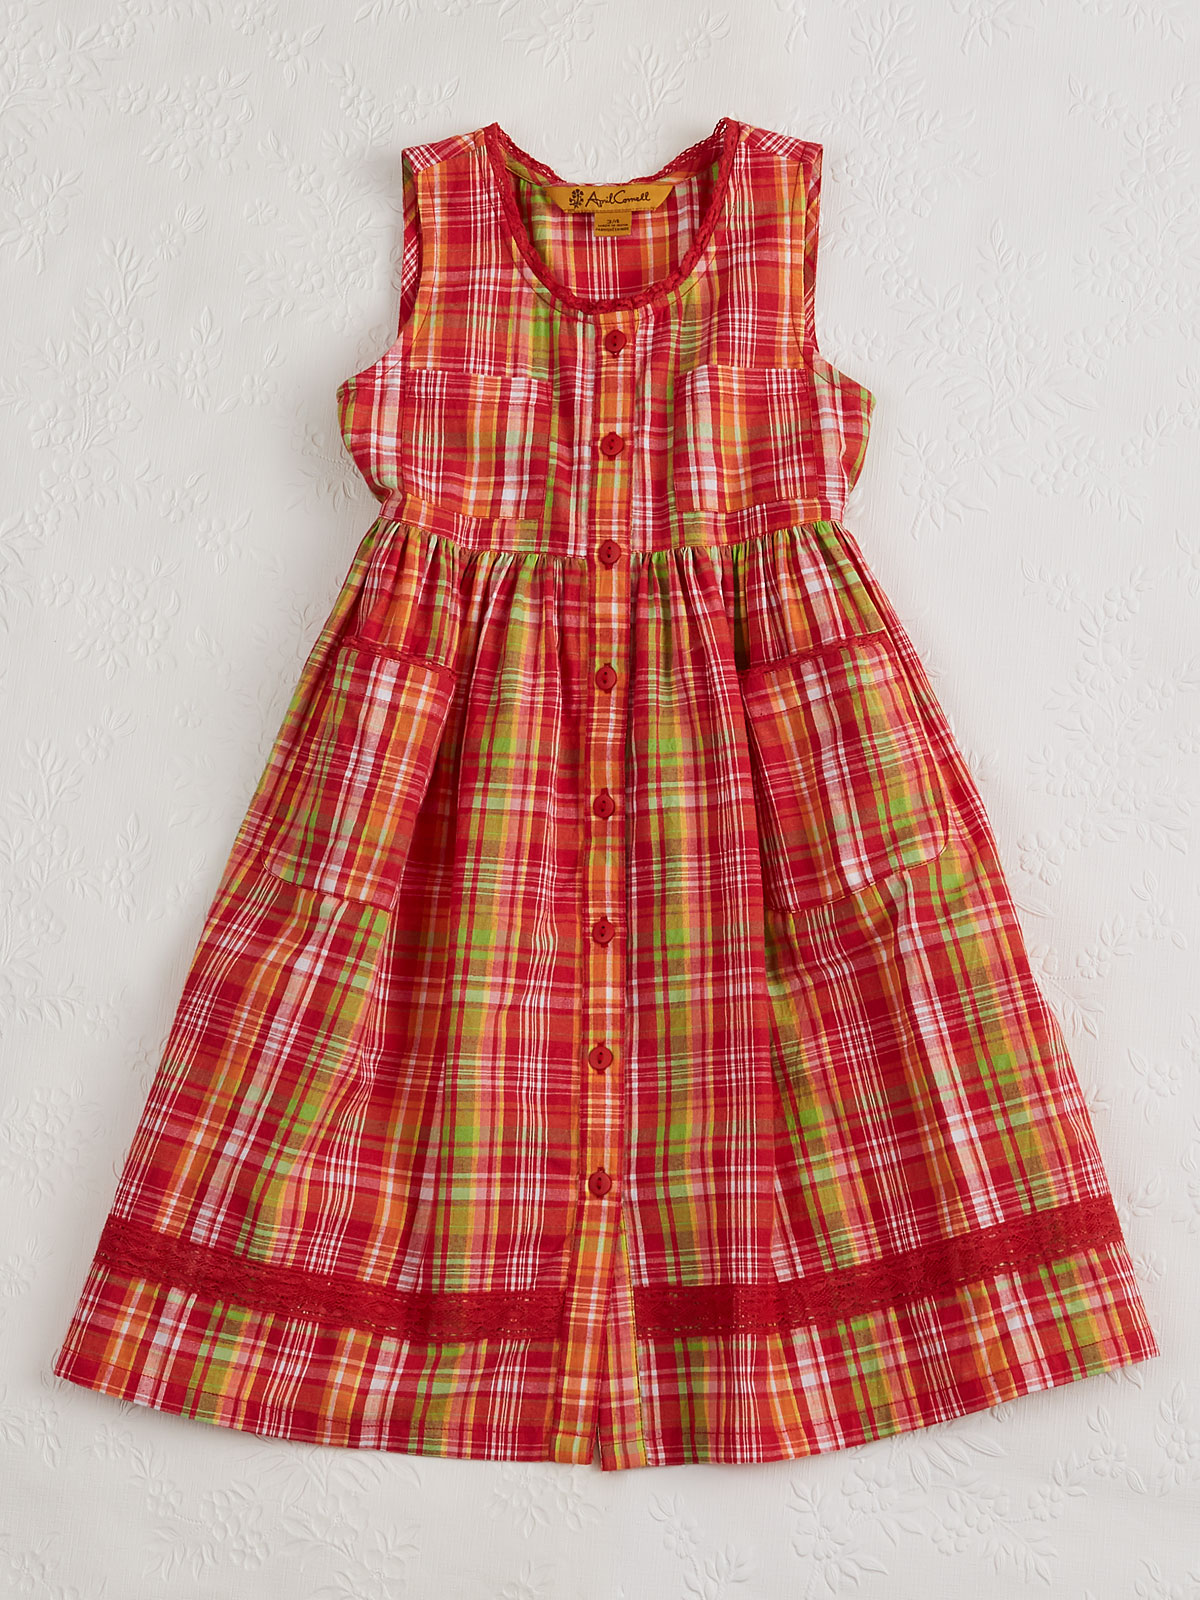 Watermelon Plaid Girls Dress